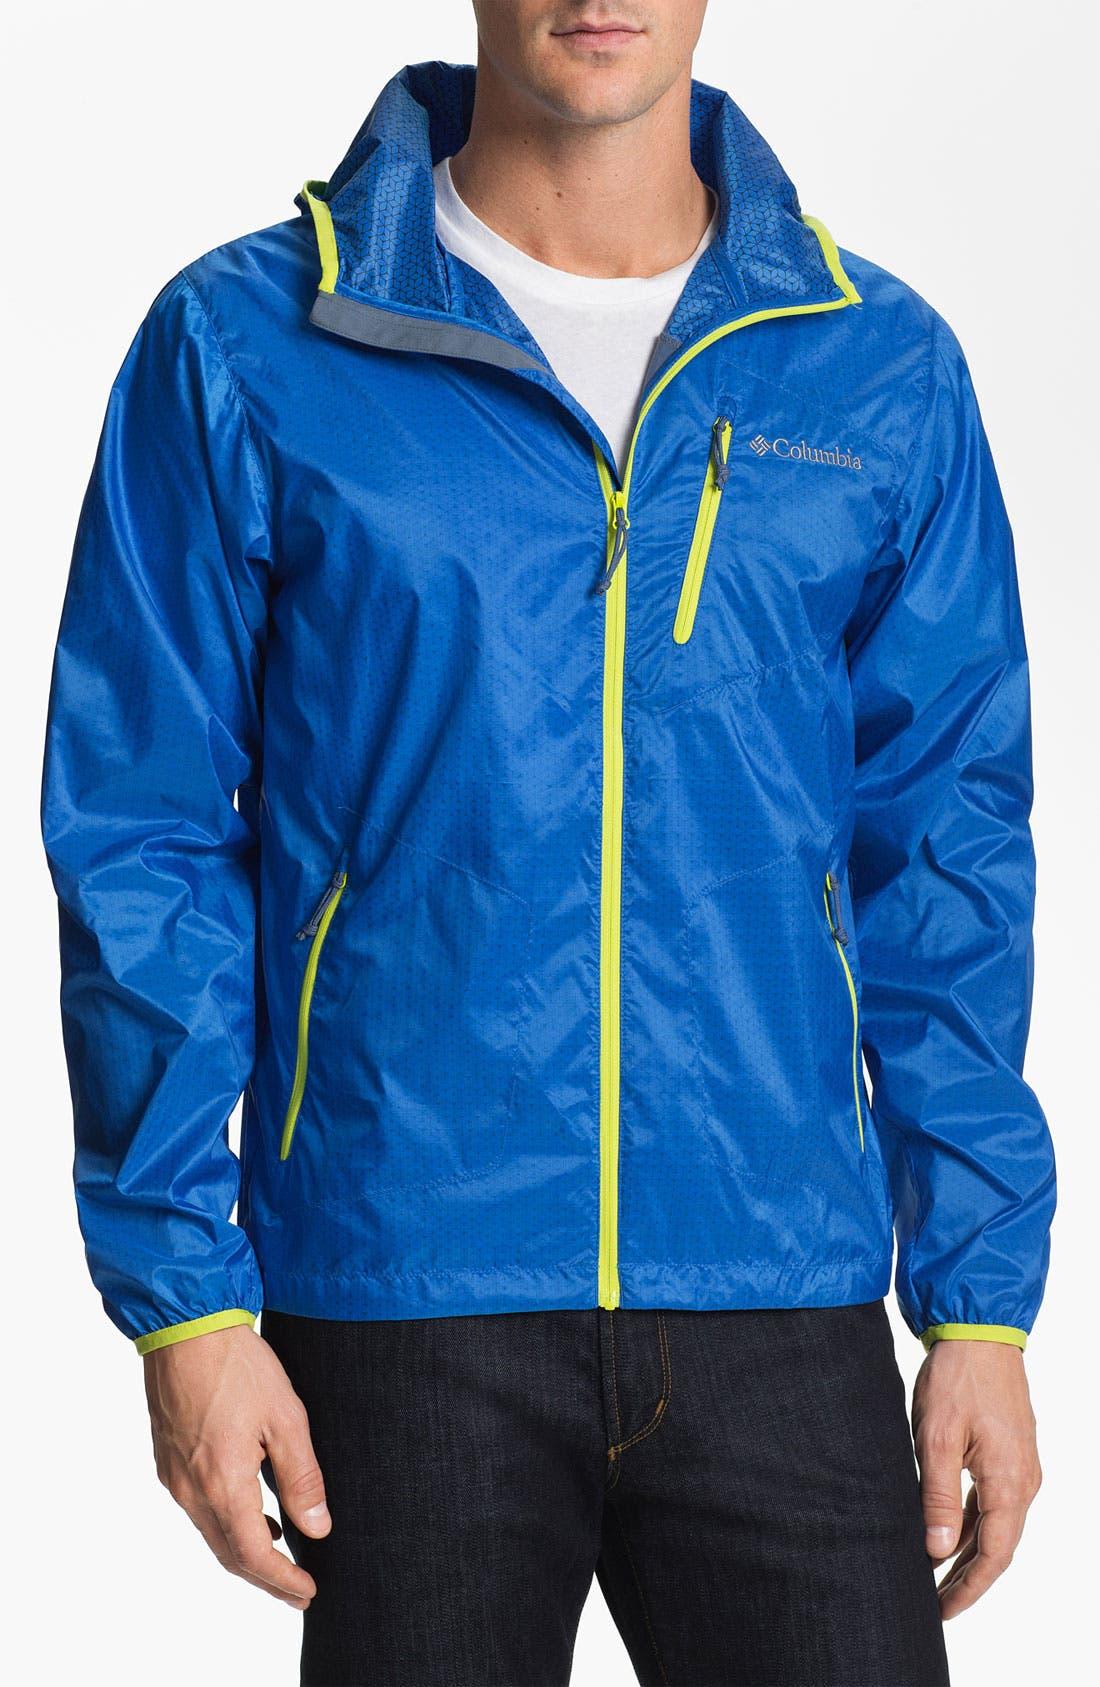 Main Image - Columbia 'Trail Drier™' Windbreaker Jacket